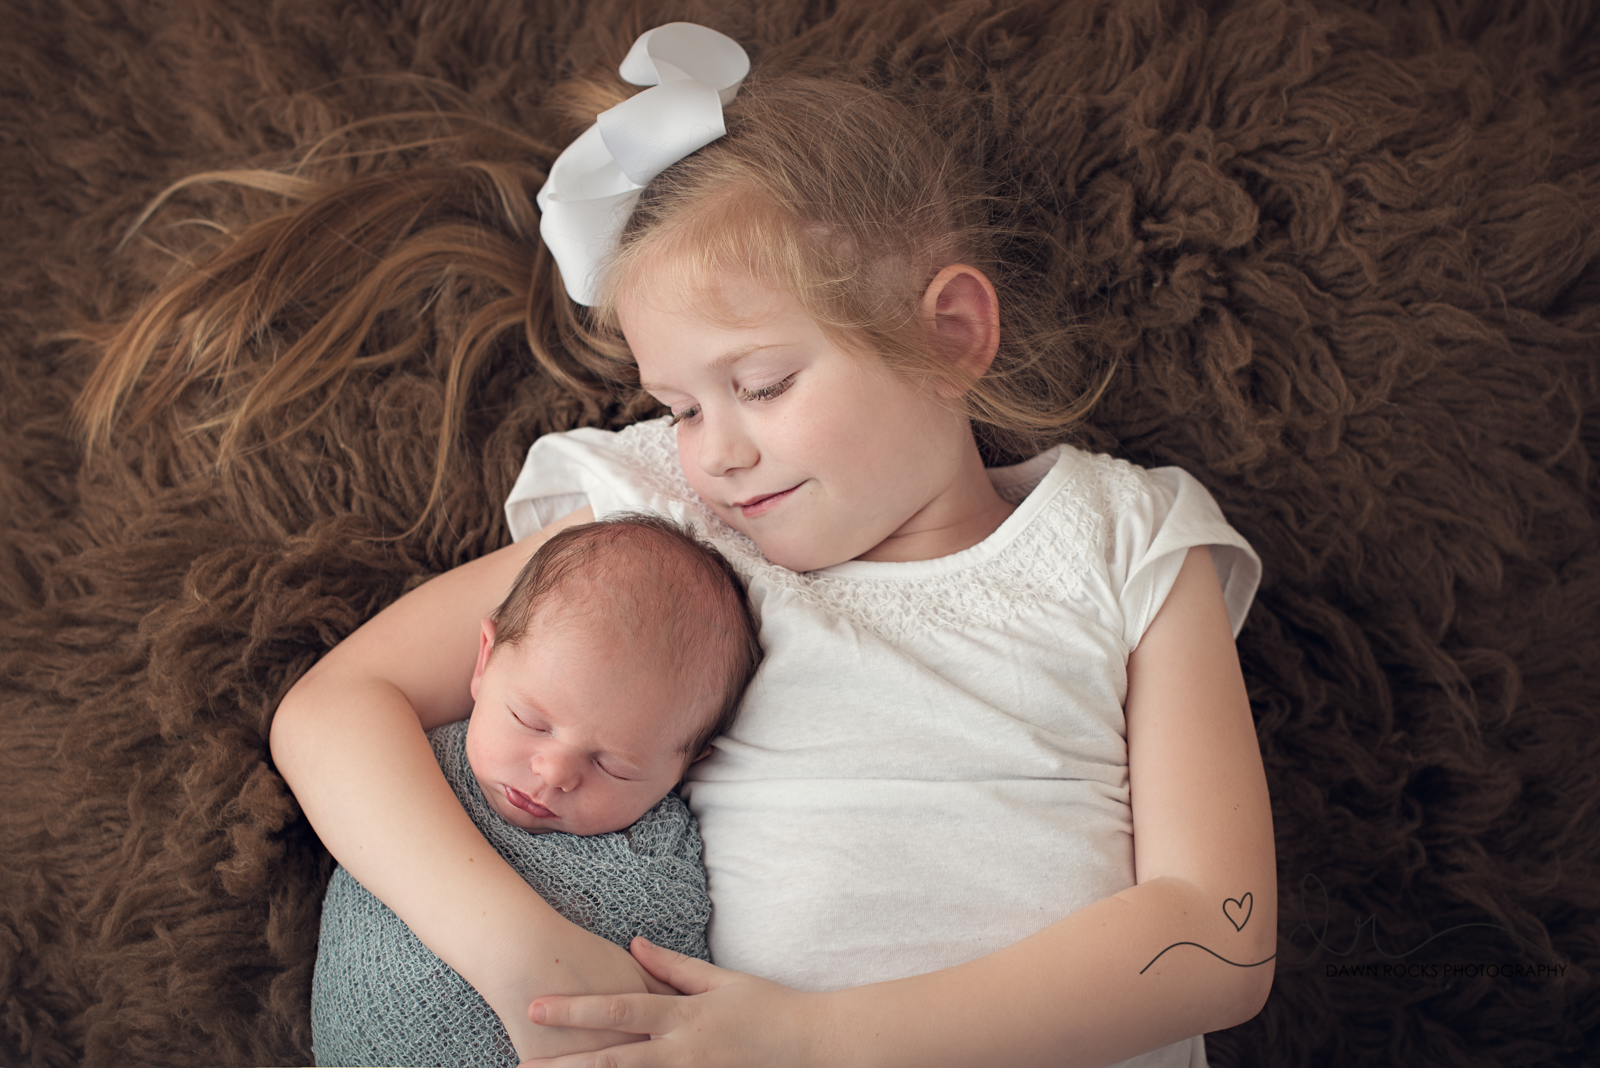 Tacoma Baby Photographer (19 of 20).JPG